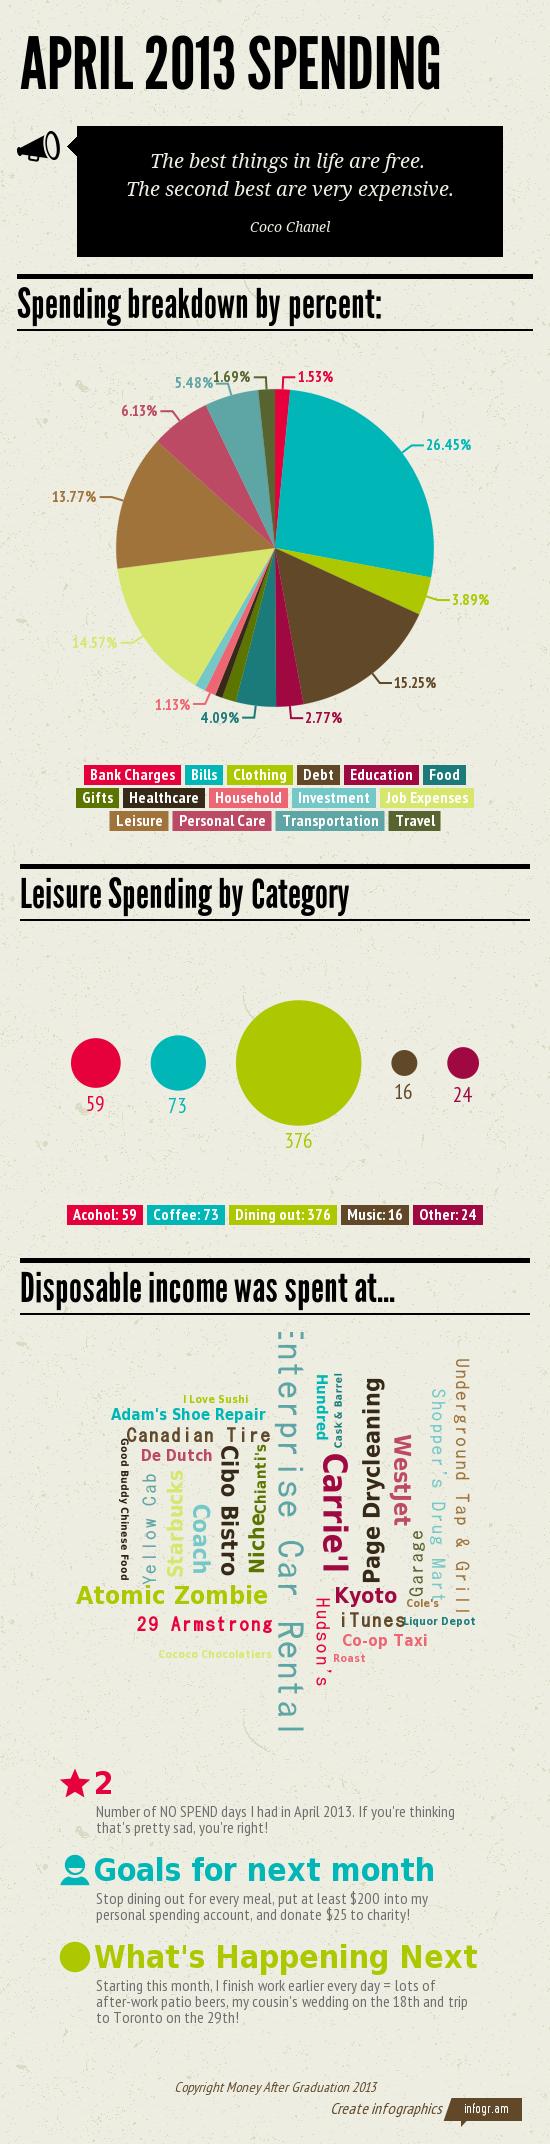 April 2013 Spending-1